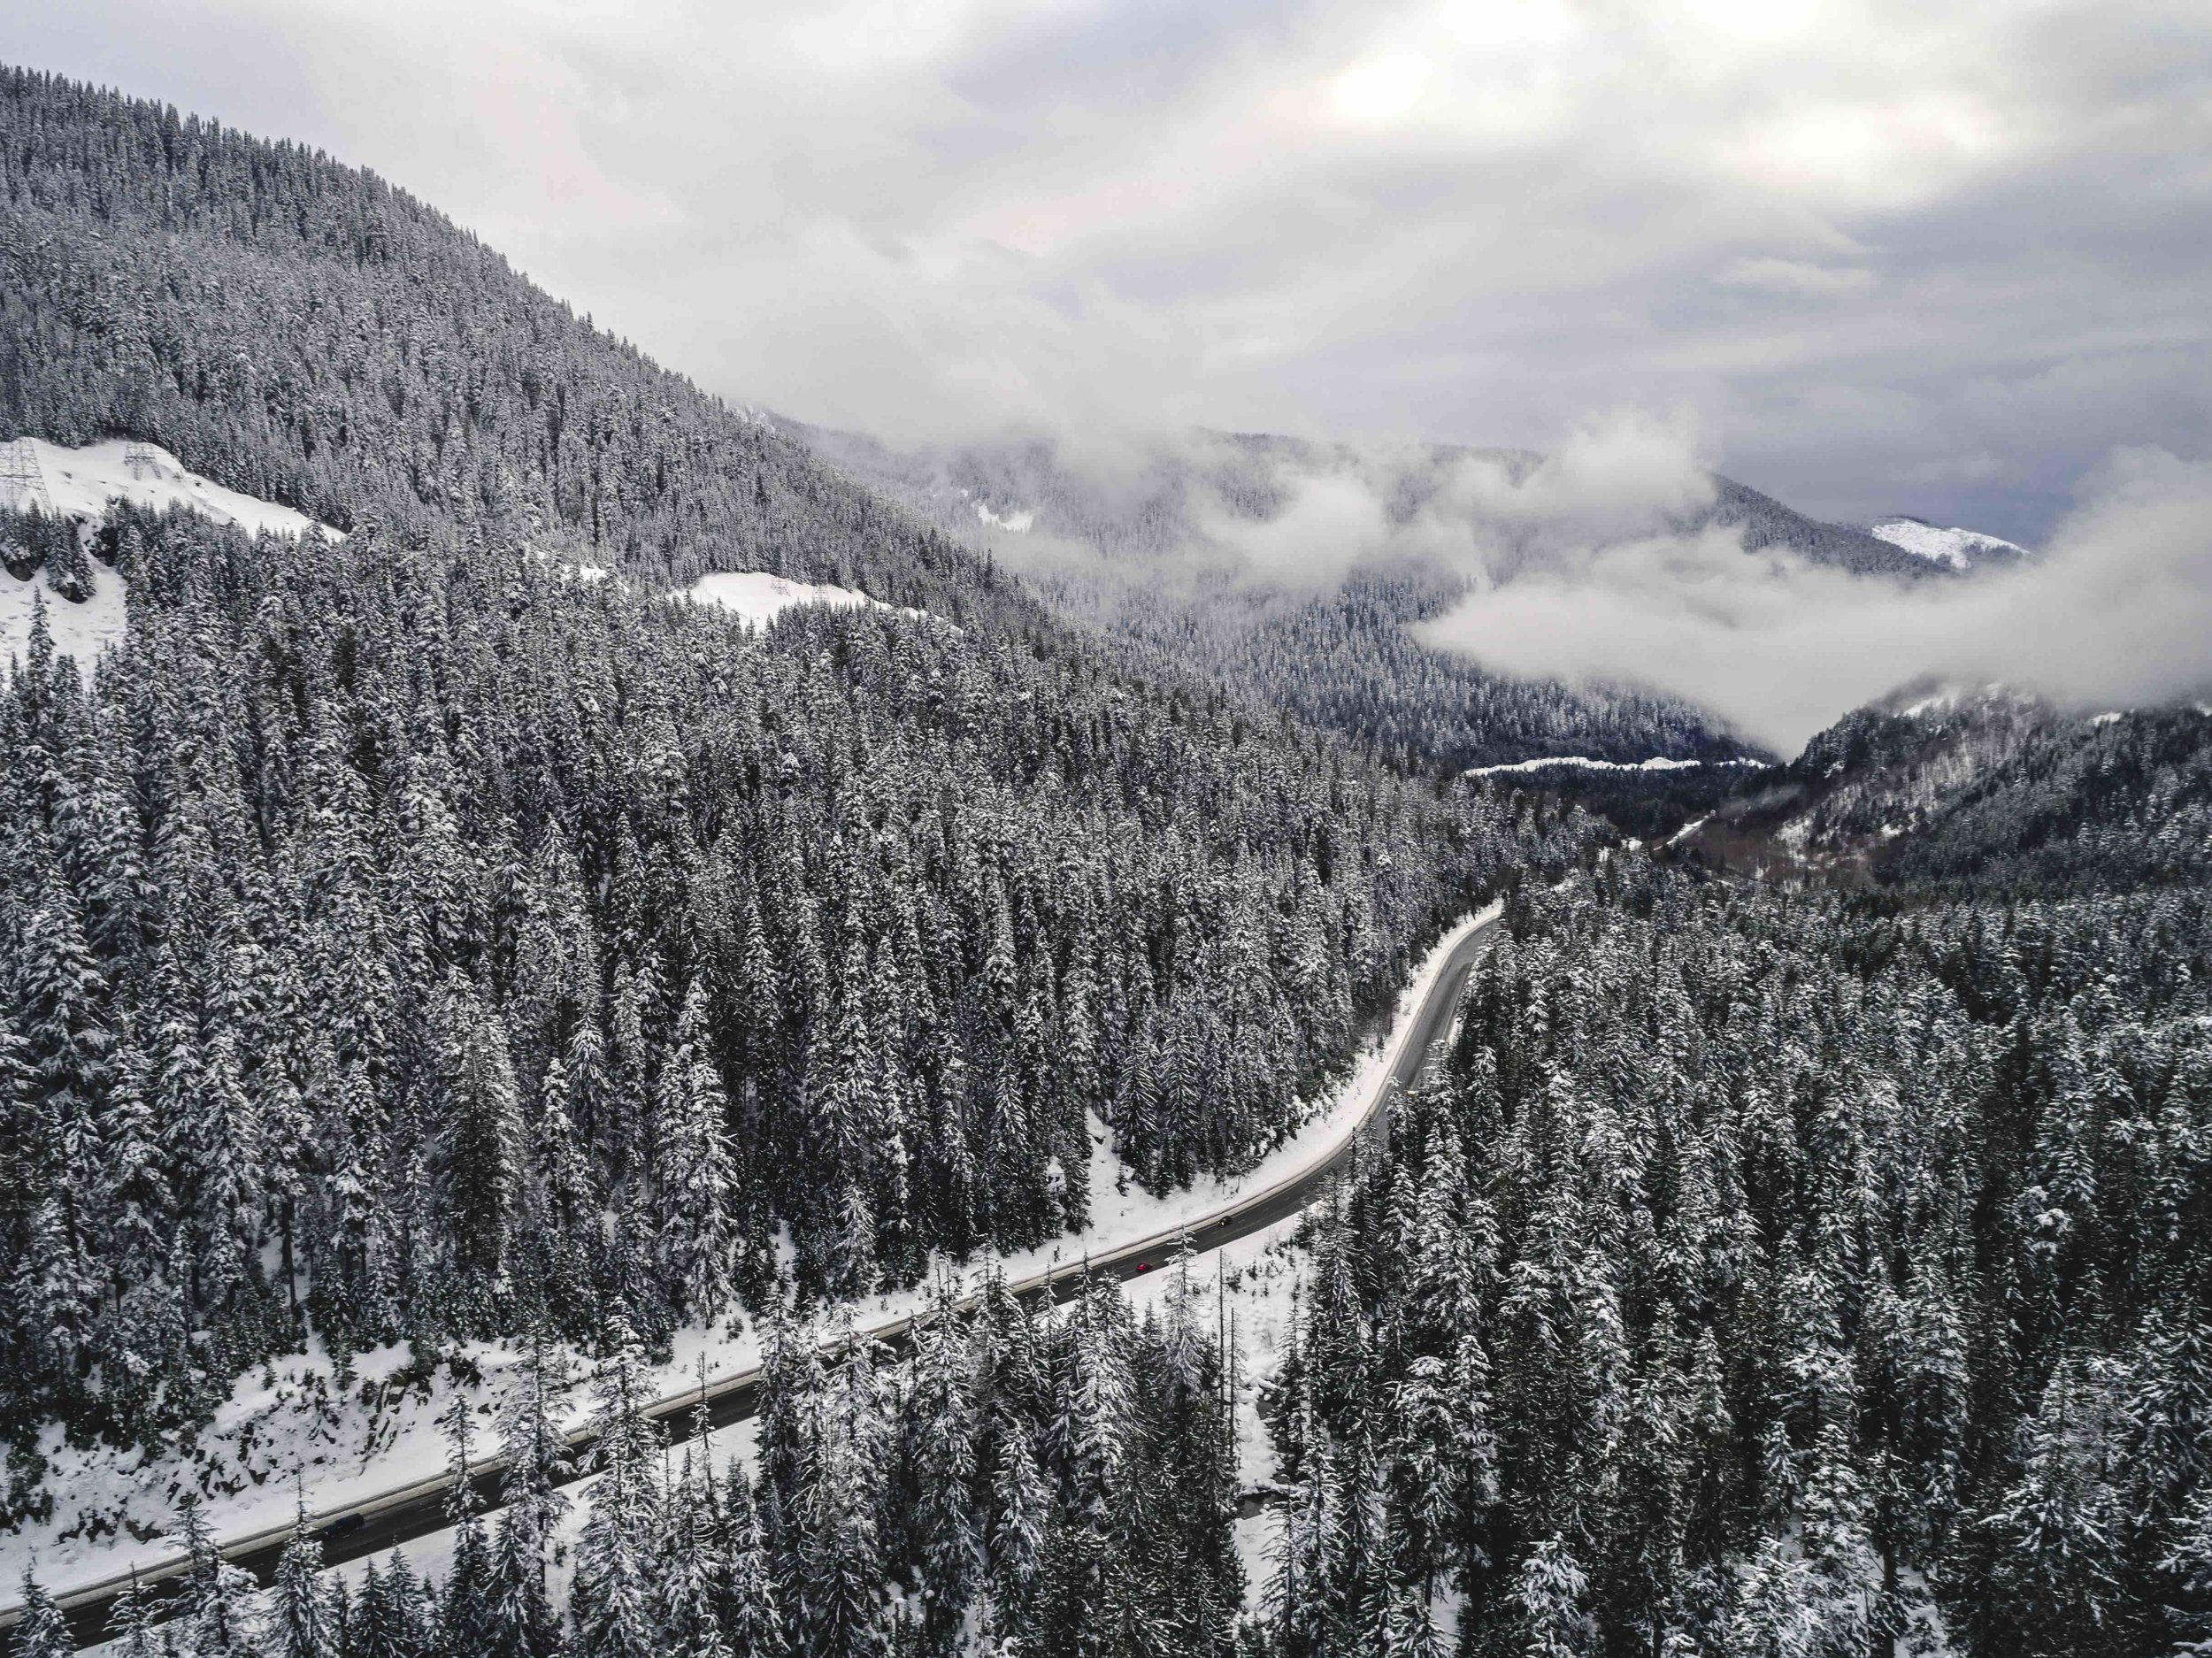 Snowy_Stevens_Pass_Washington_Mountain_Highway_Aerial.jpeg